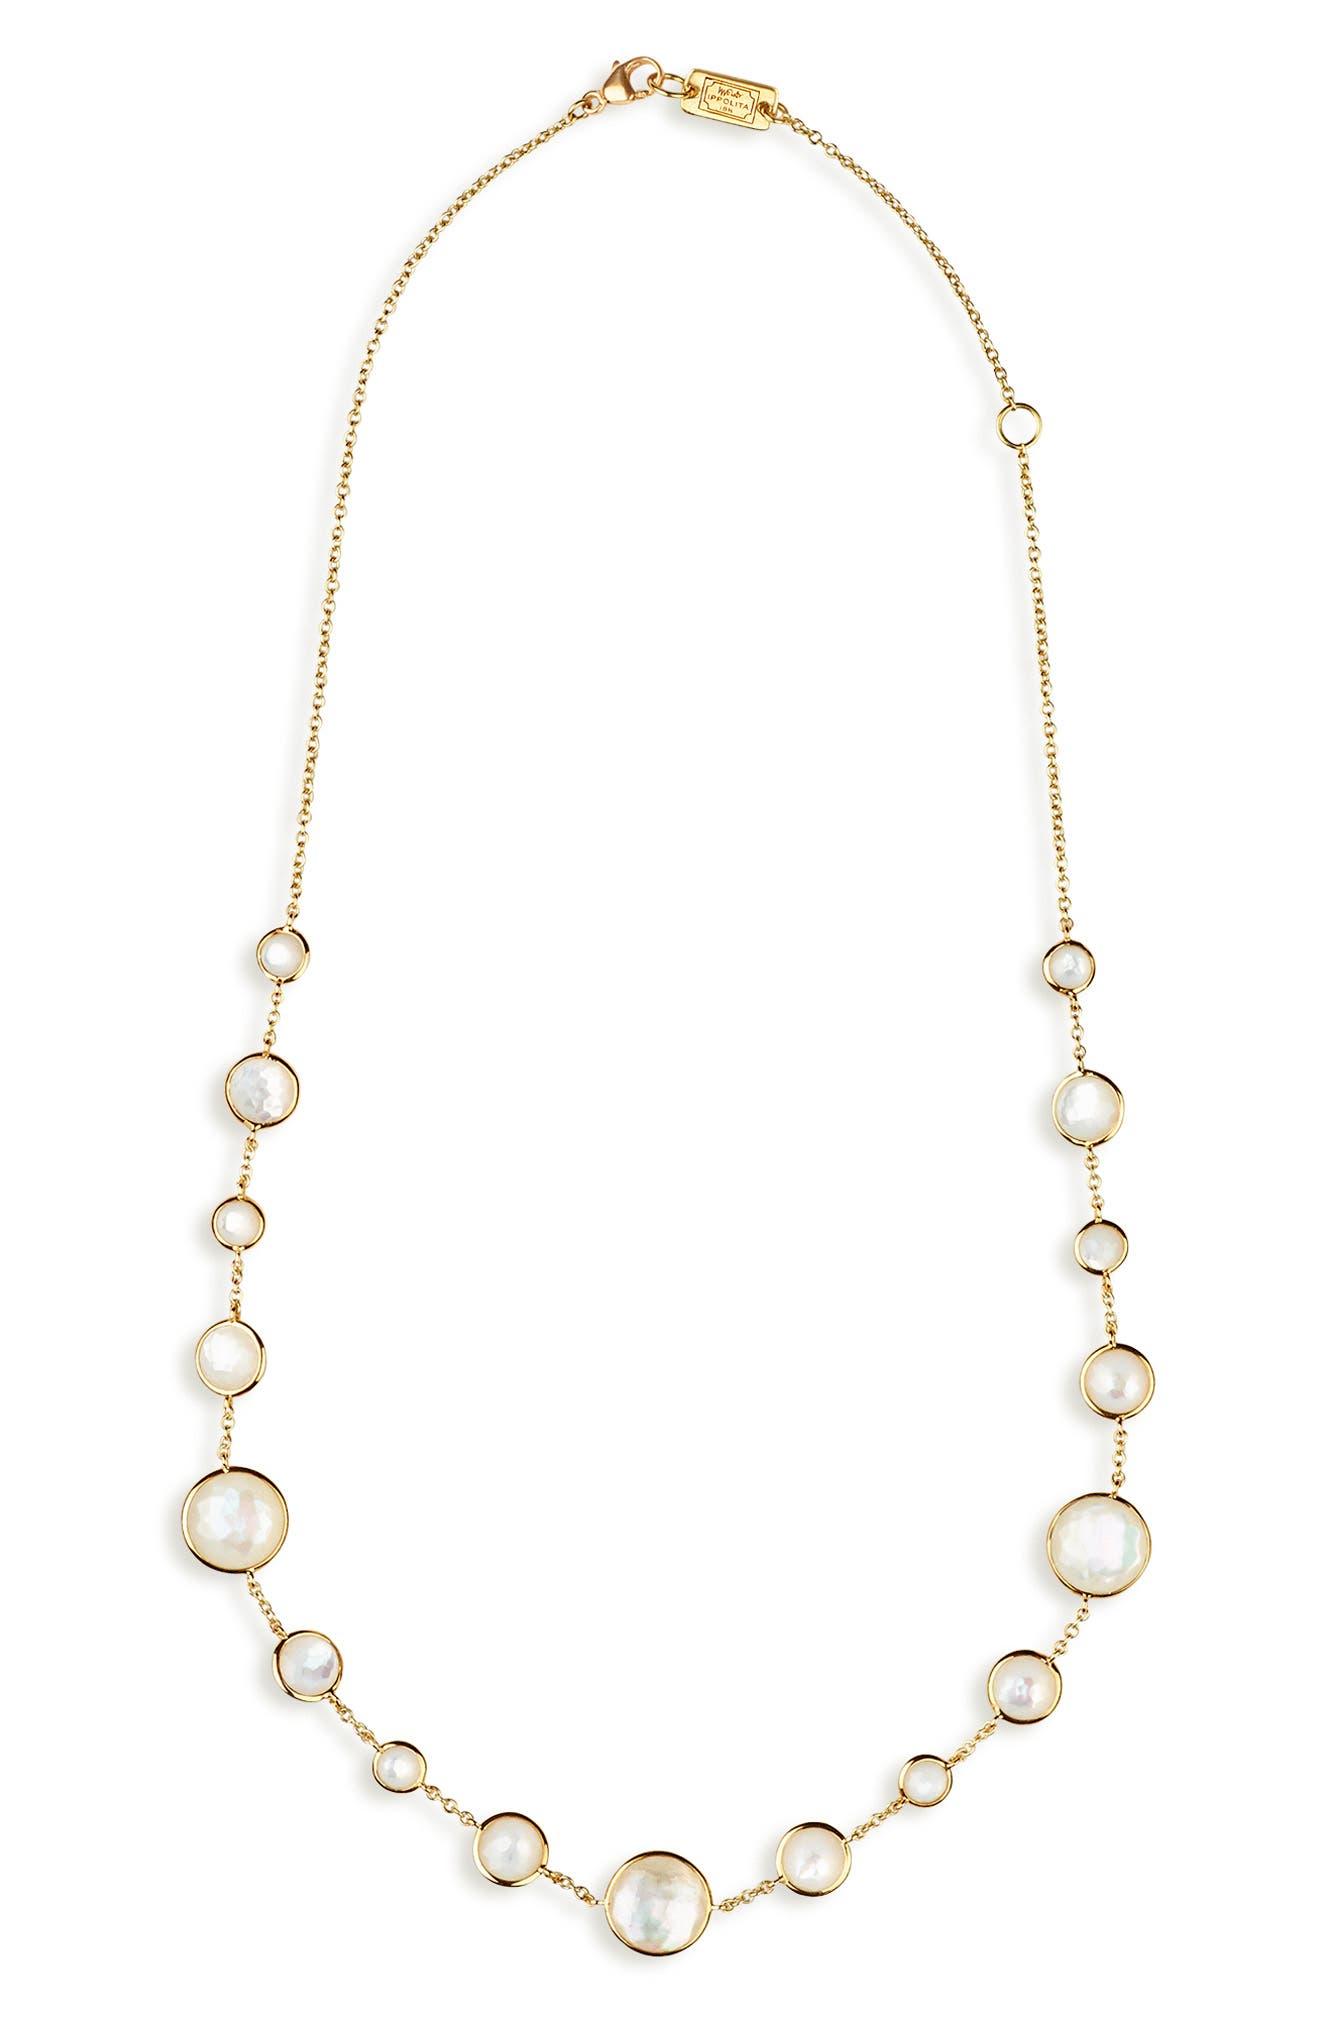 Lollipop Lollitini Necklace,                             Main thumbnail 1, color,                             GOLD/ PEARLS